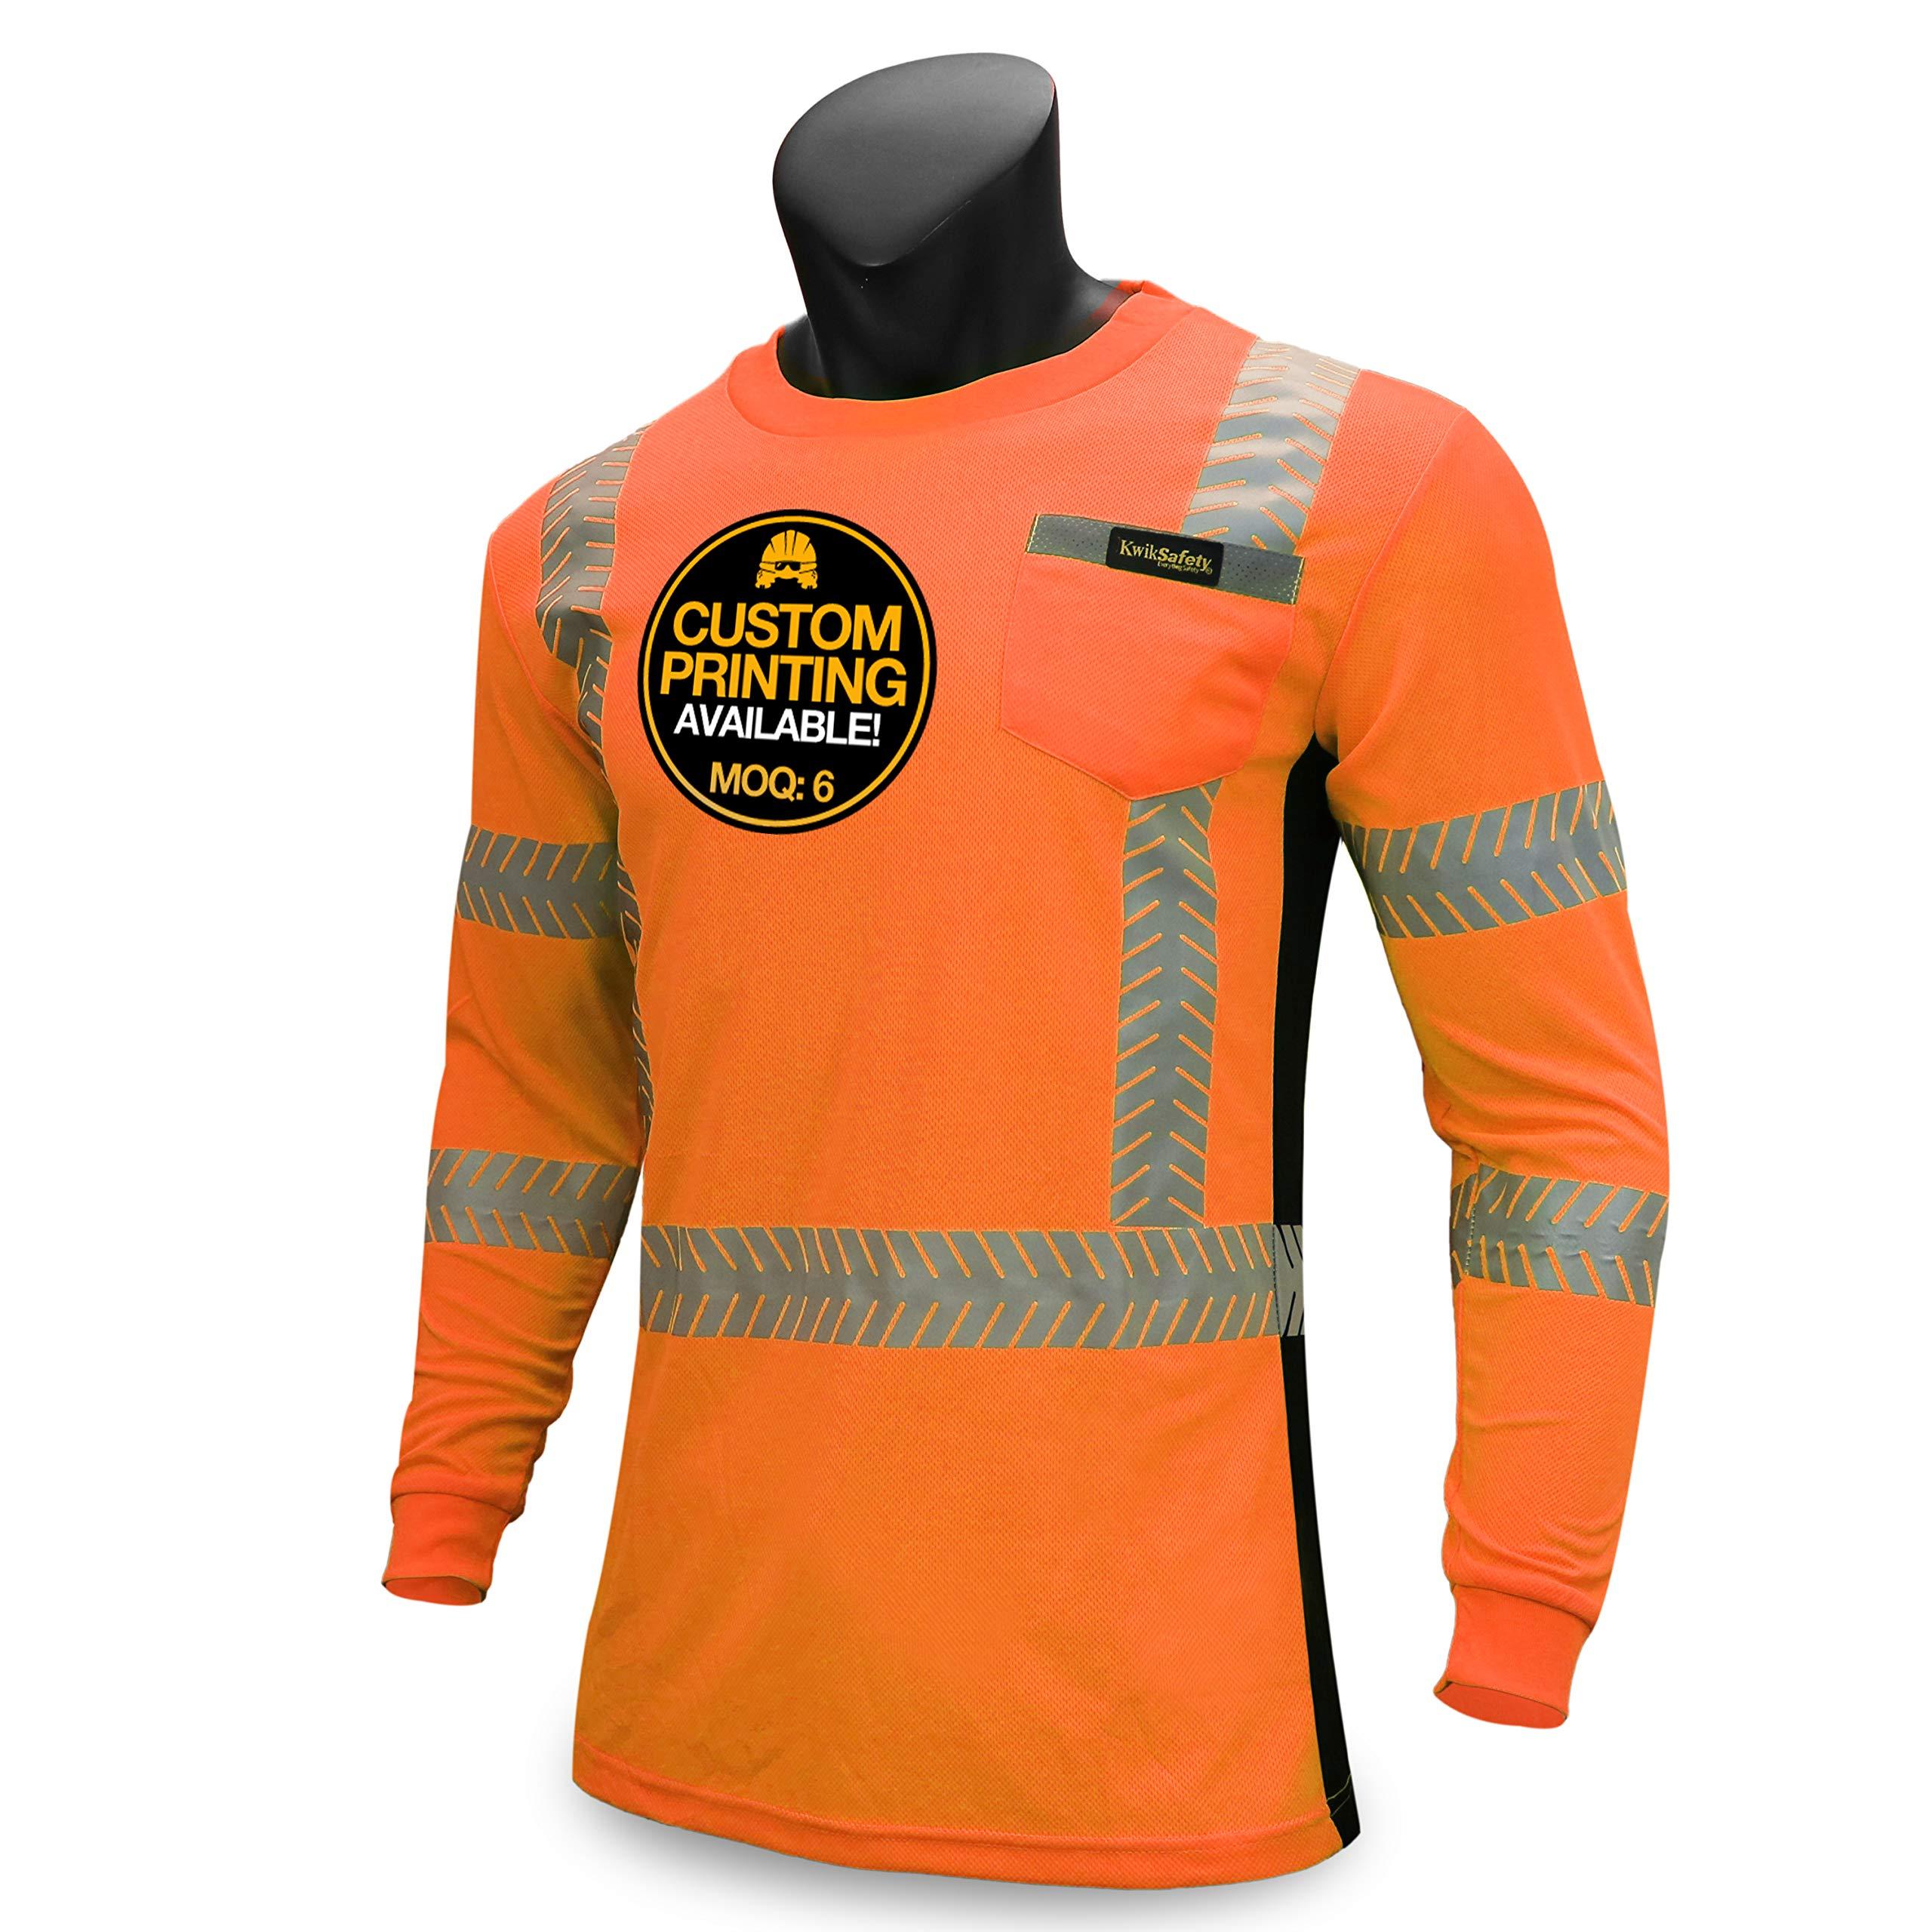 KwikSafety (Charlotte, NC) RENAISSANCE MAN | Class 3 Long Sleeve Safety Shirt | ANSI Work Wear | Hi Vis Moisture Wicking Silver Fishbone | Men Women Construction Exercise Security | Orange Large